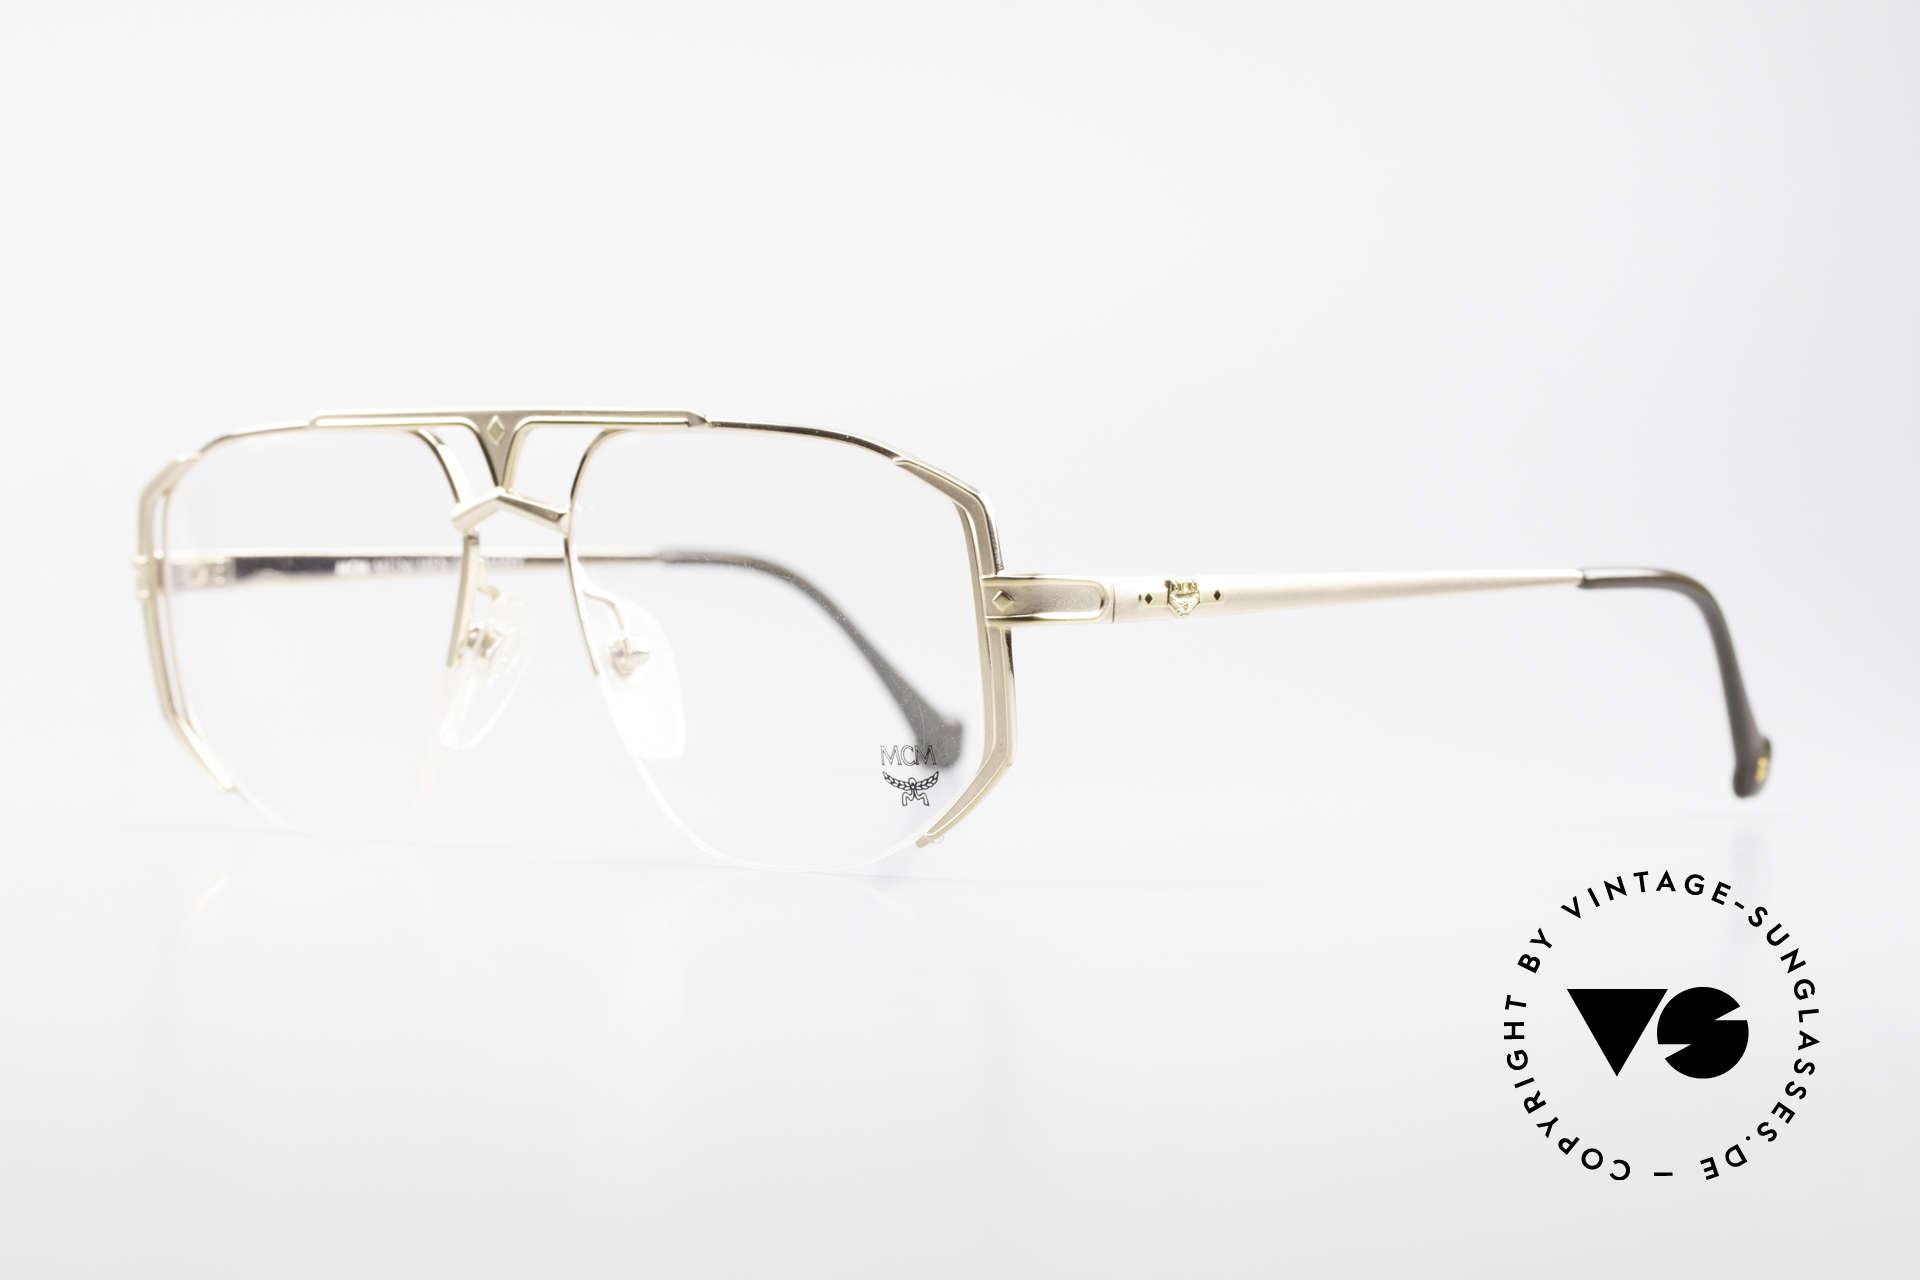 MCM München 5 Titanium Eyeglasses Large, luxury eyeglasses by Michael Cromer (MC), Munich (M), Made for Men